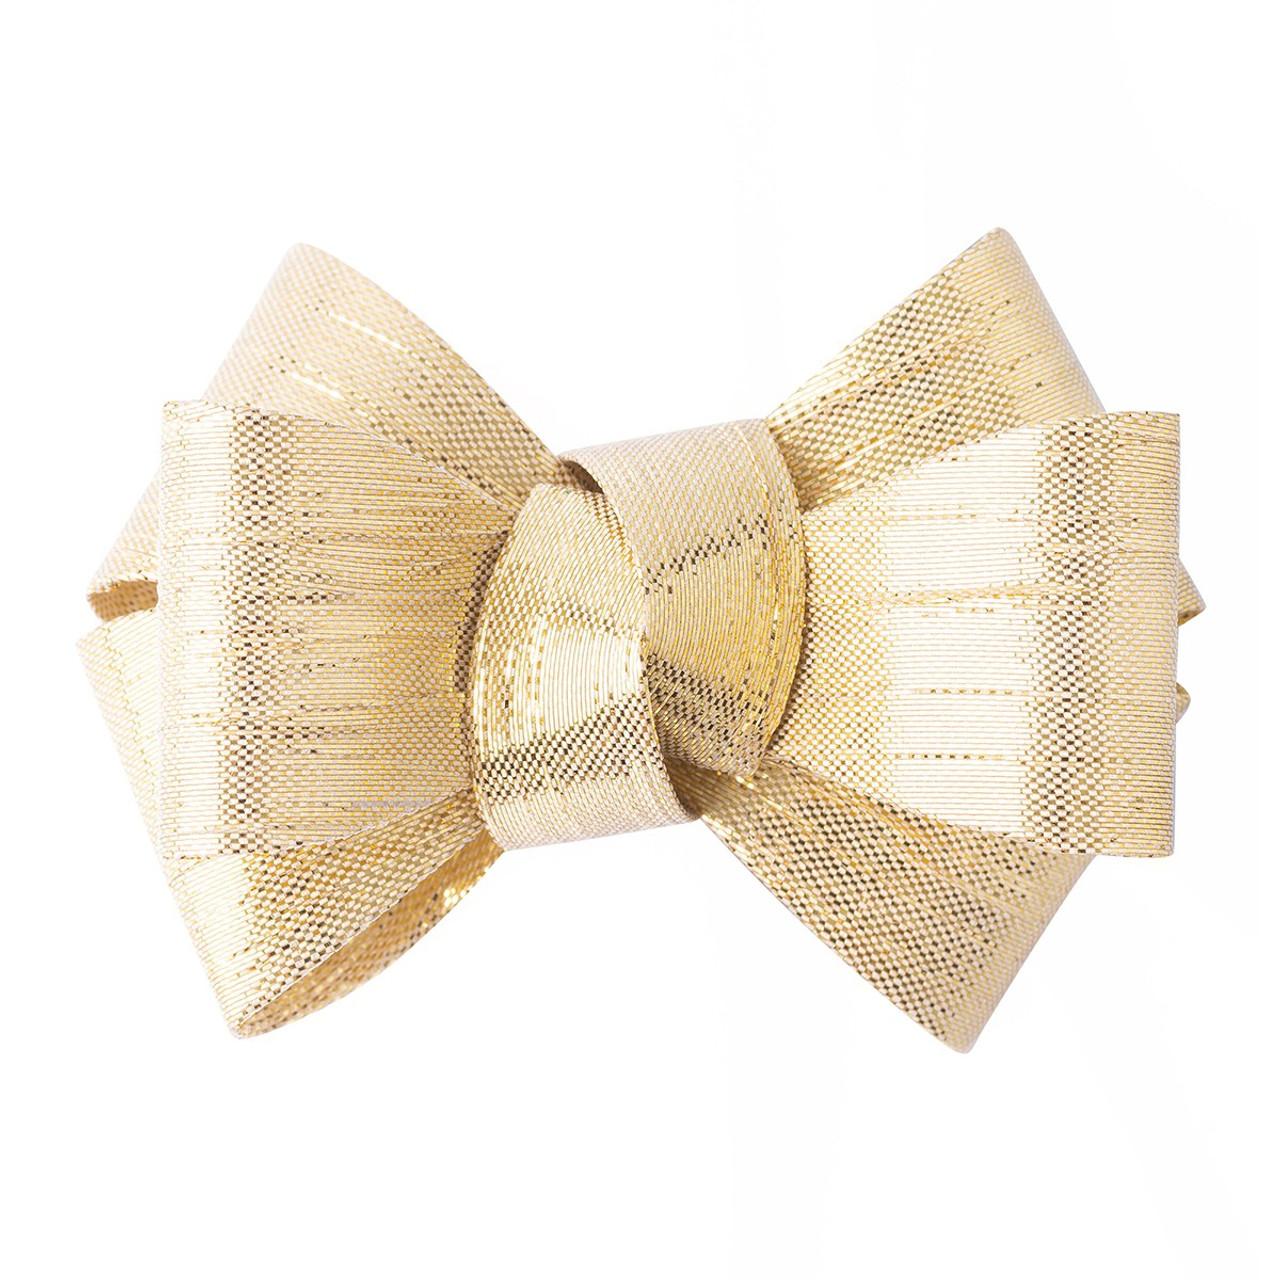 Juliska Tuxedo Gold Napkin Ring Set 4